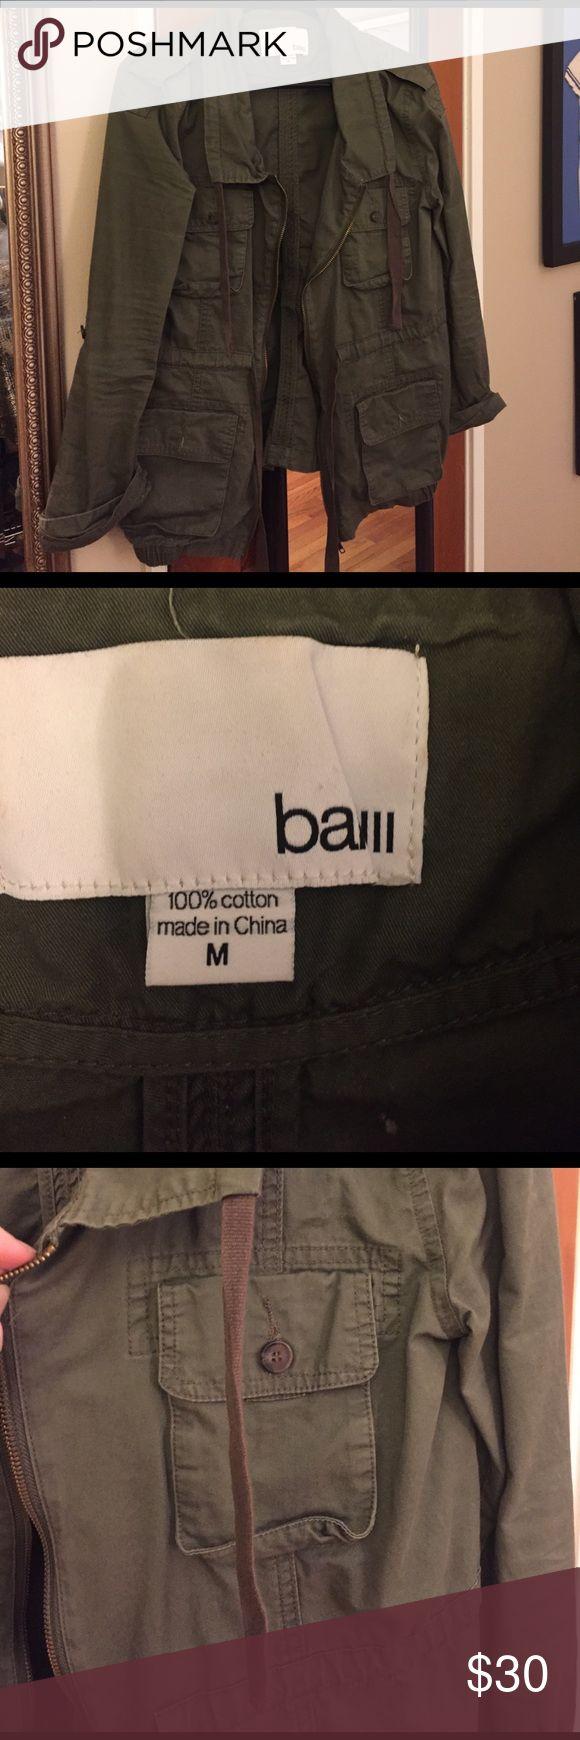 Green military jacket Great jacket! Super cute. In good condition Bar III Jackets & Coats Utility Jackets